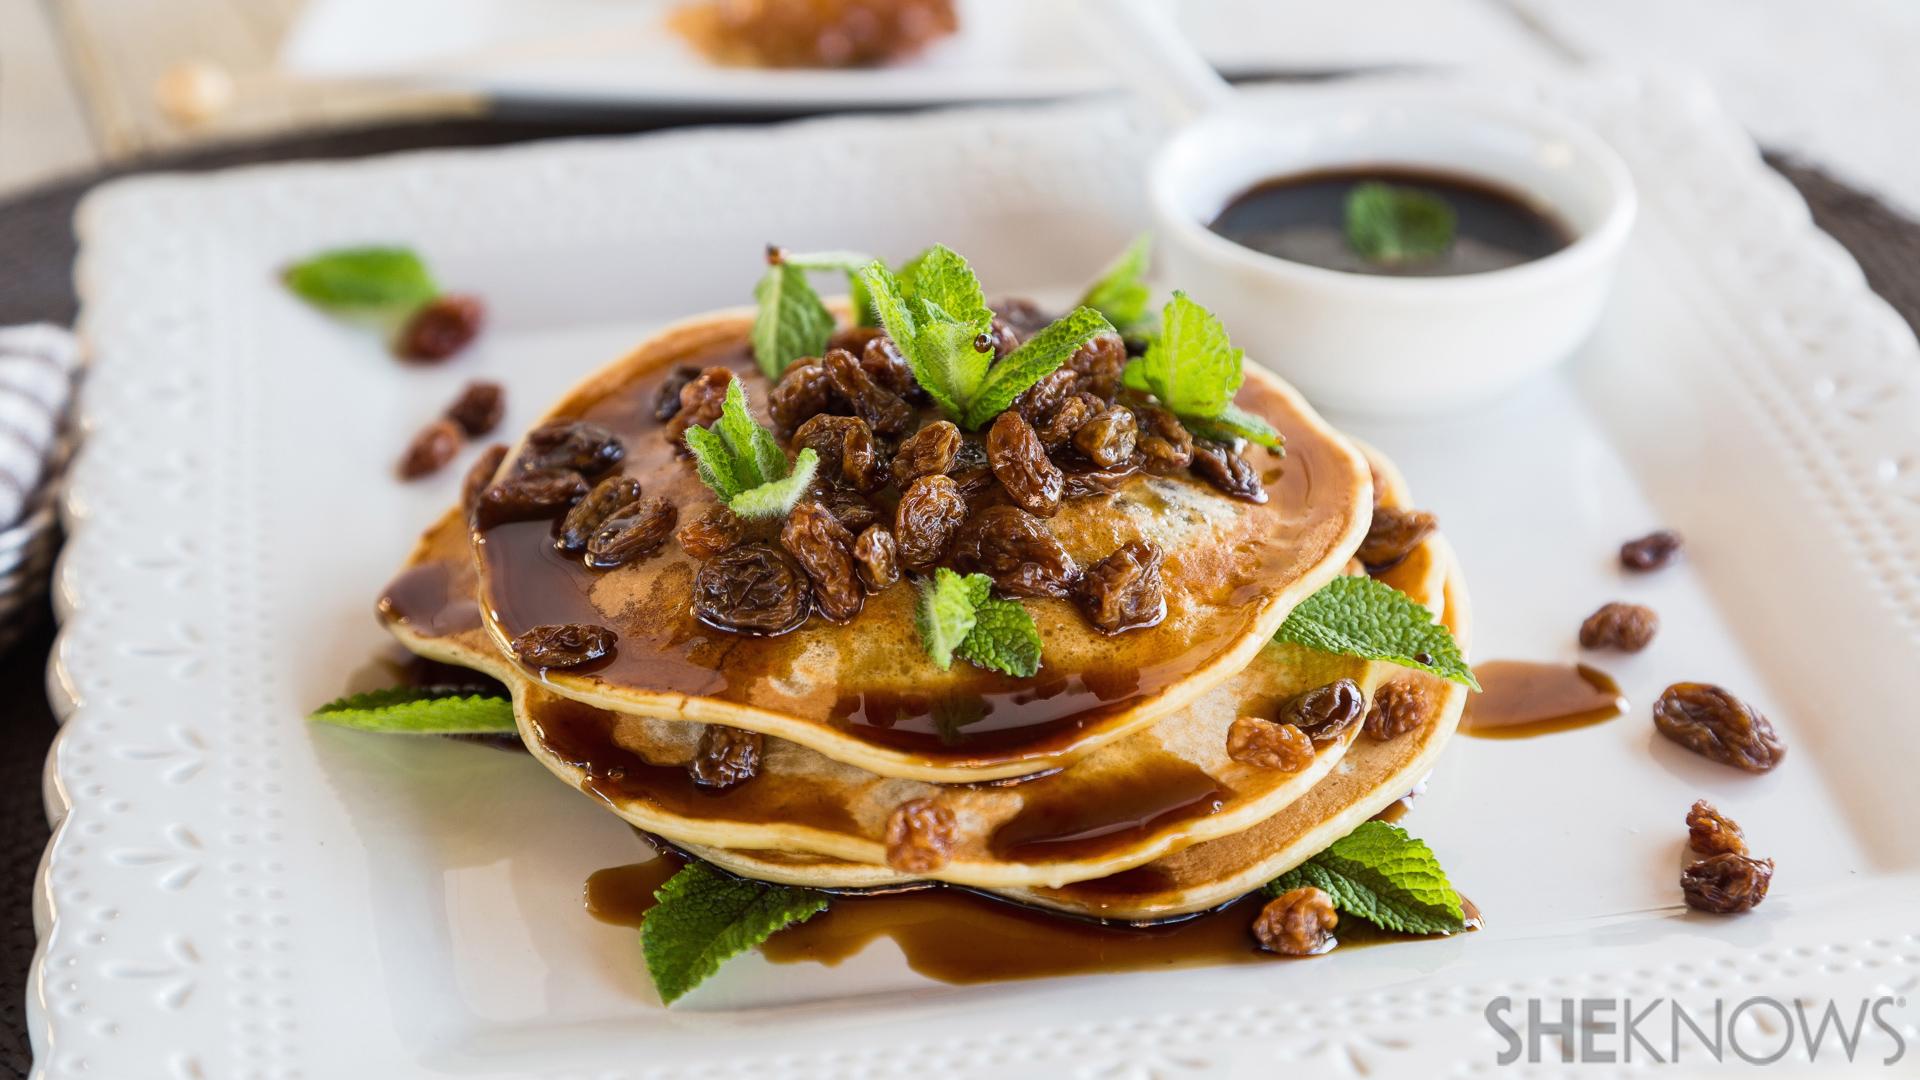 Rum raisin pancakes with rum syrup